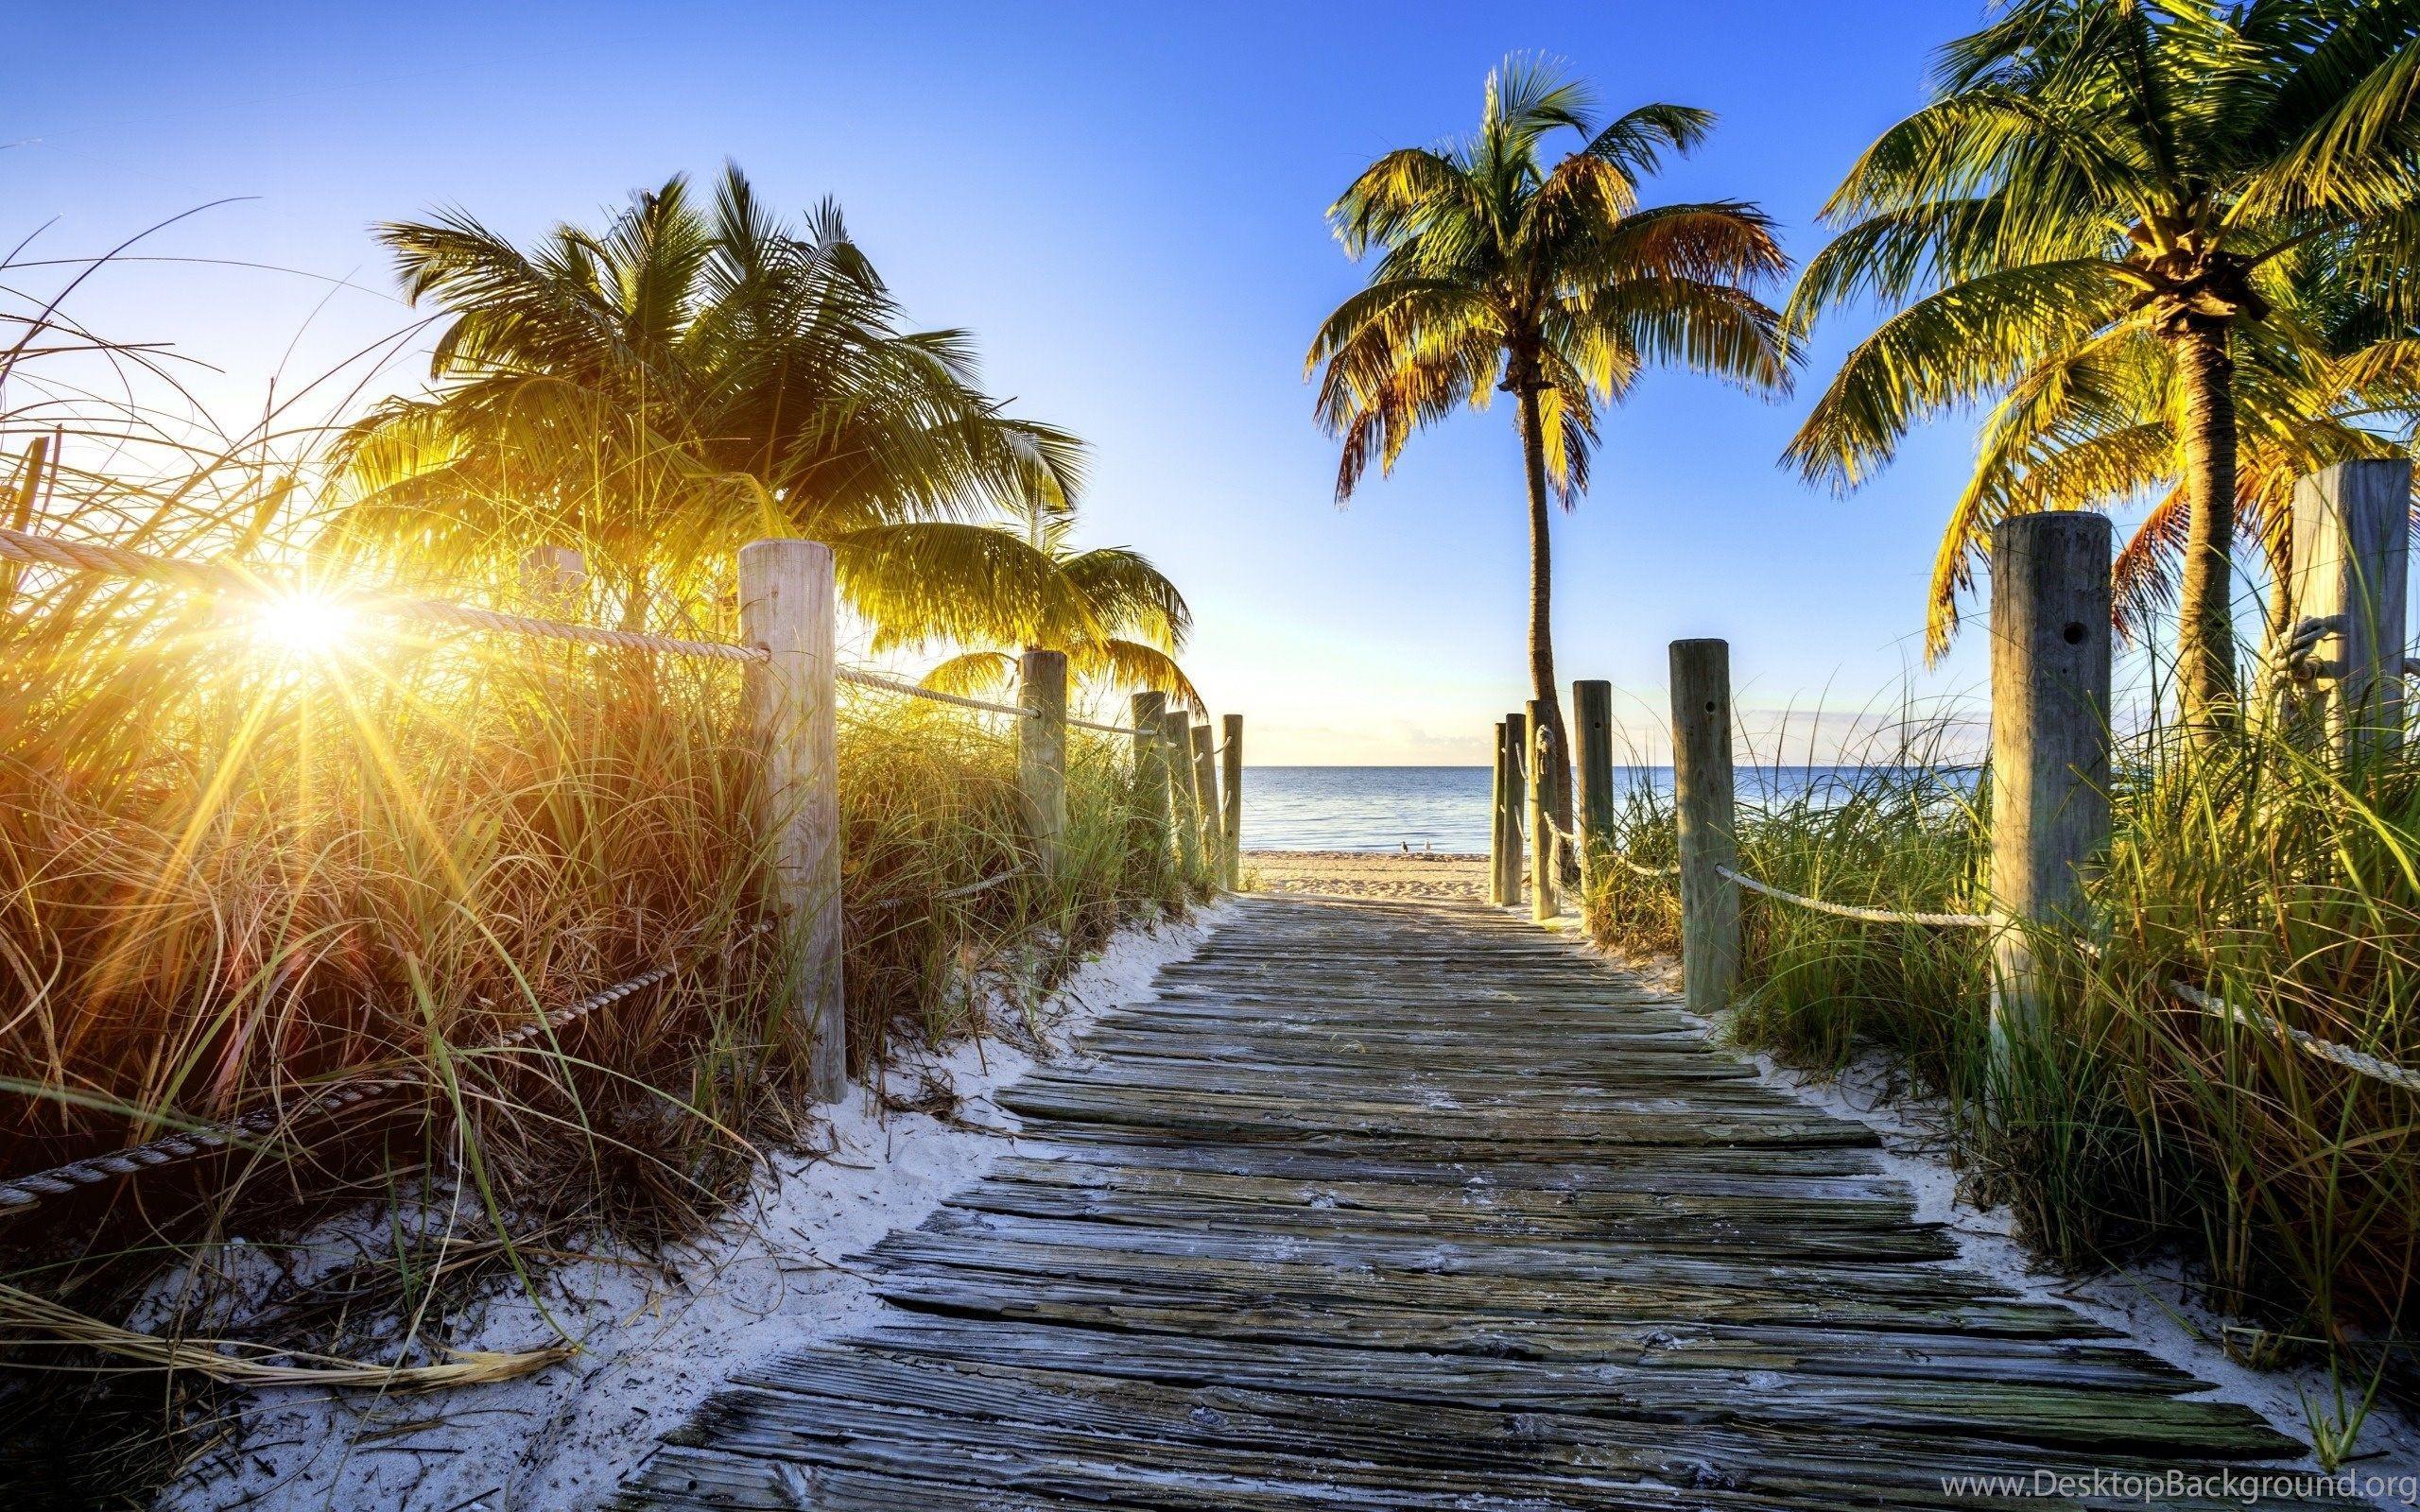 Wallpaper Naples Florida: Top Free Florida Backgrounds